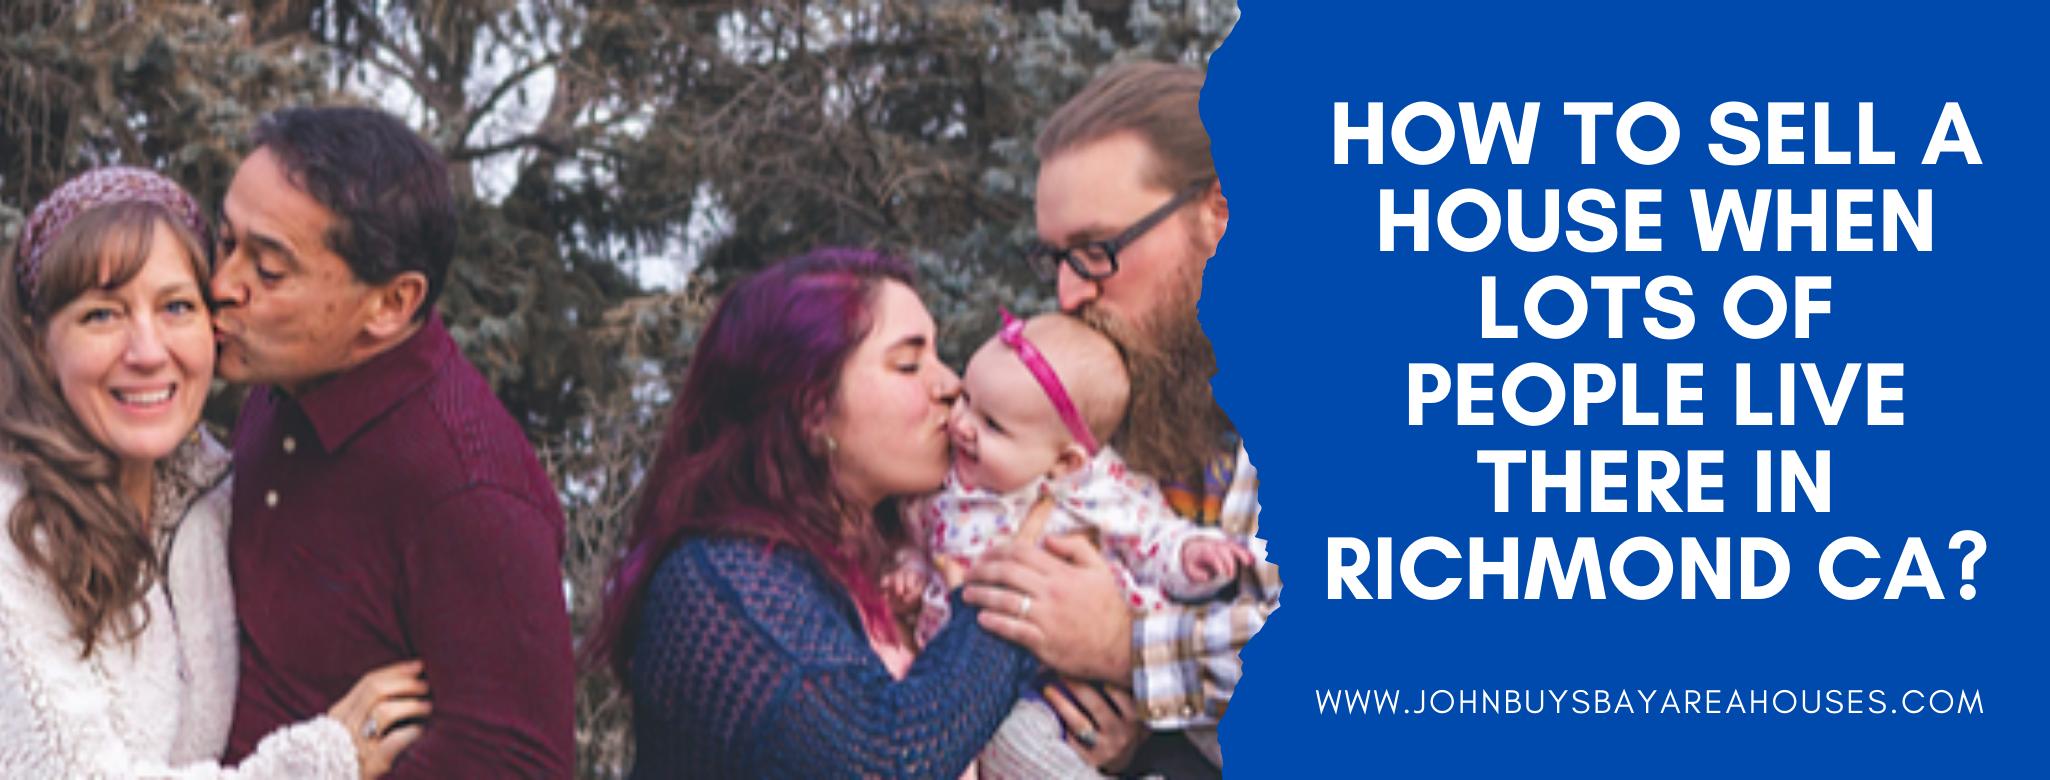 We buy properties in Richmond CA